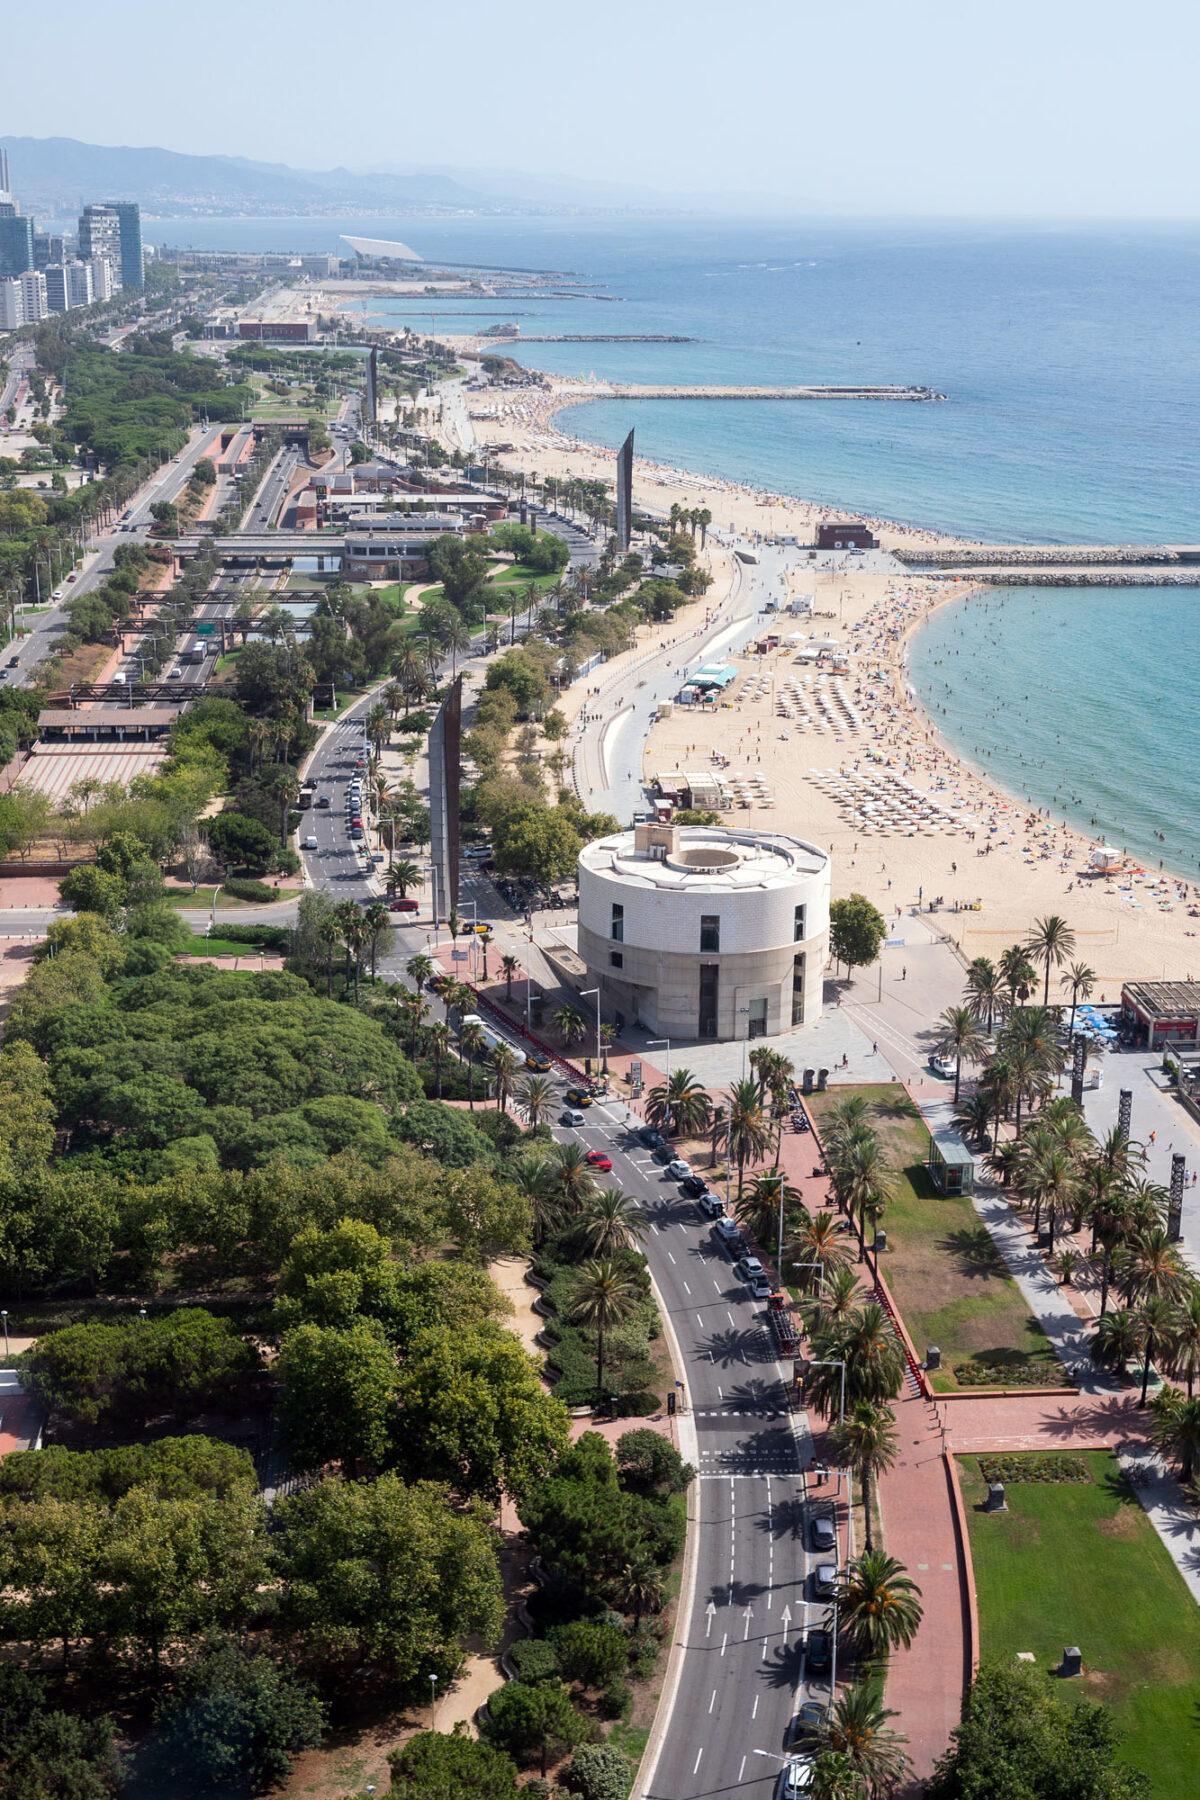 12 Barcelona Stock Photos DSC 4042